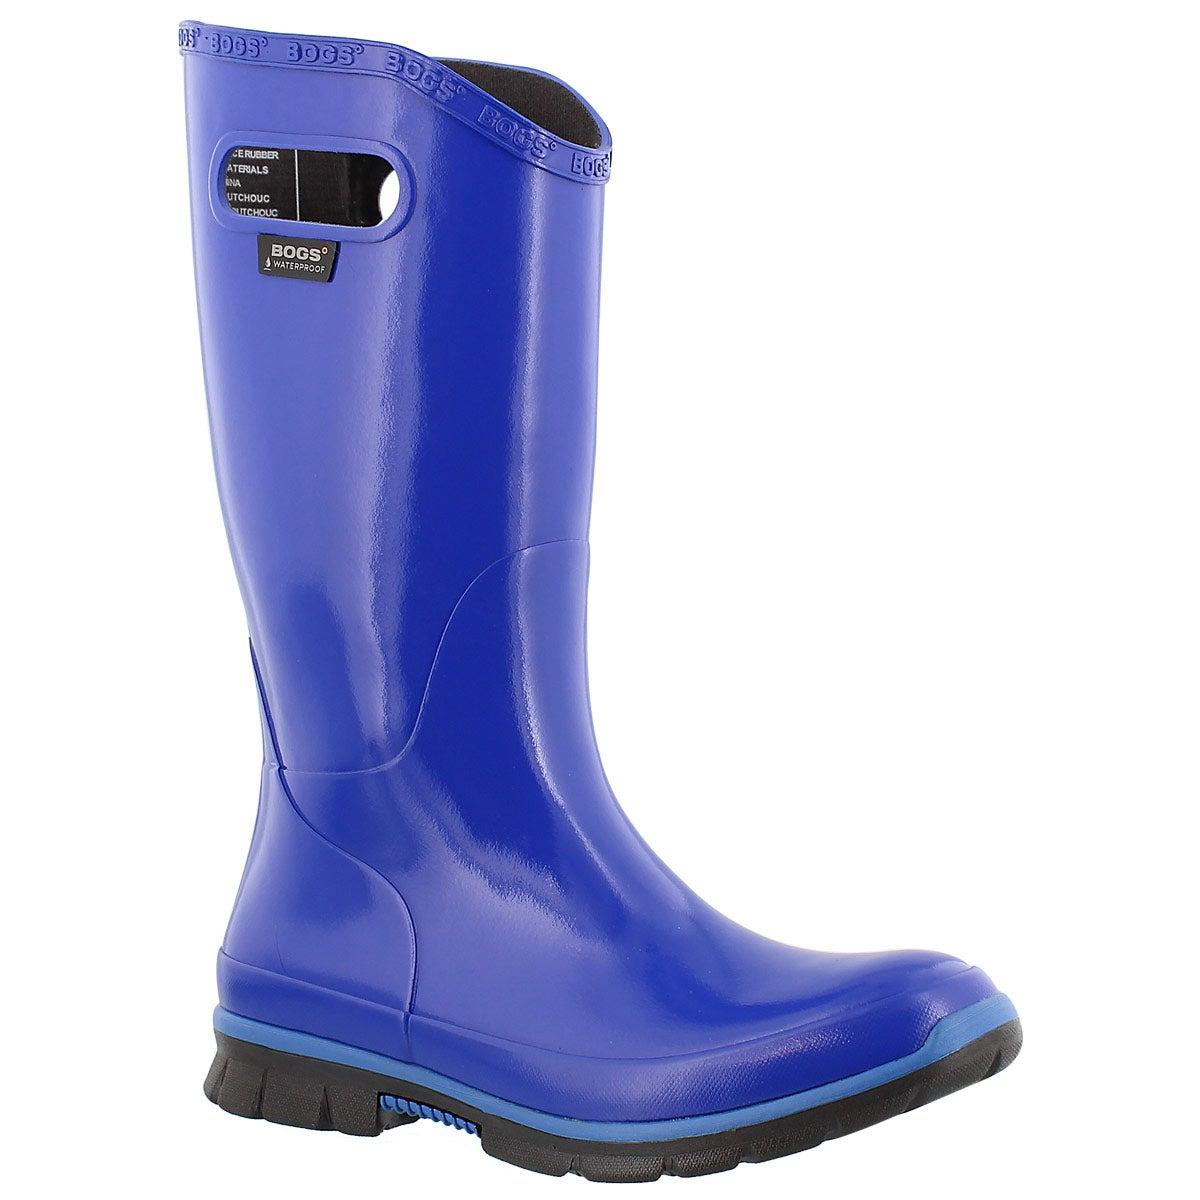 Botte de pluie haute Berkley, bleu, fem